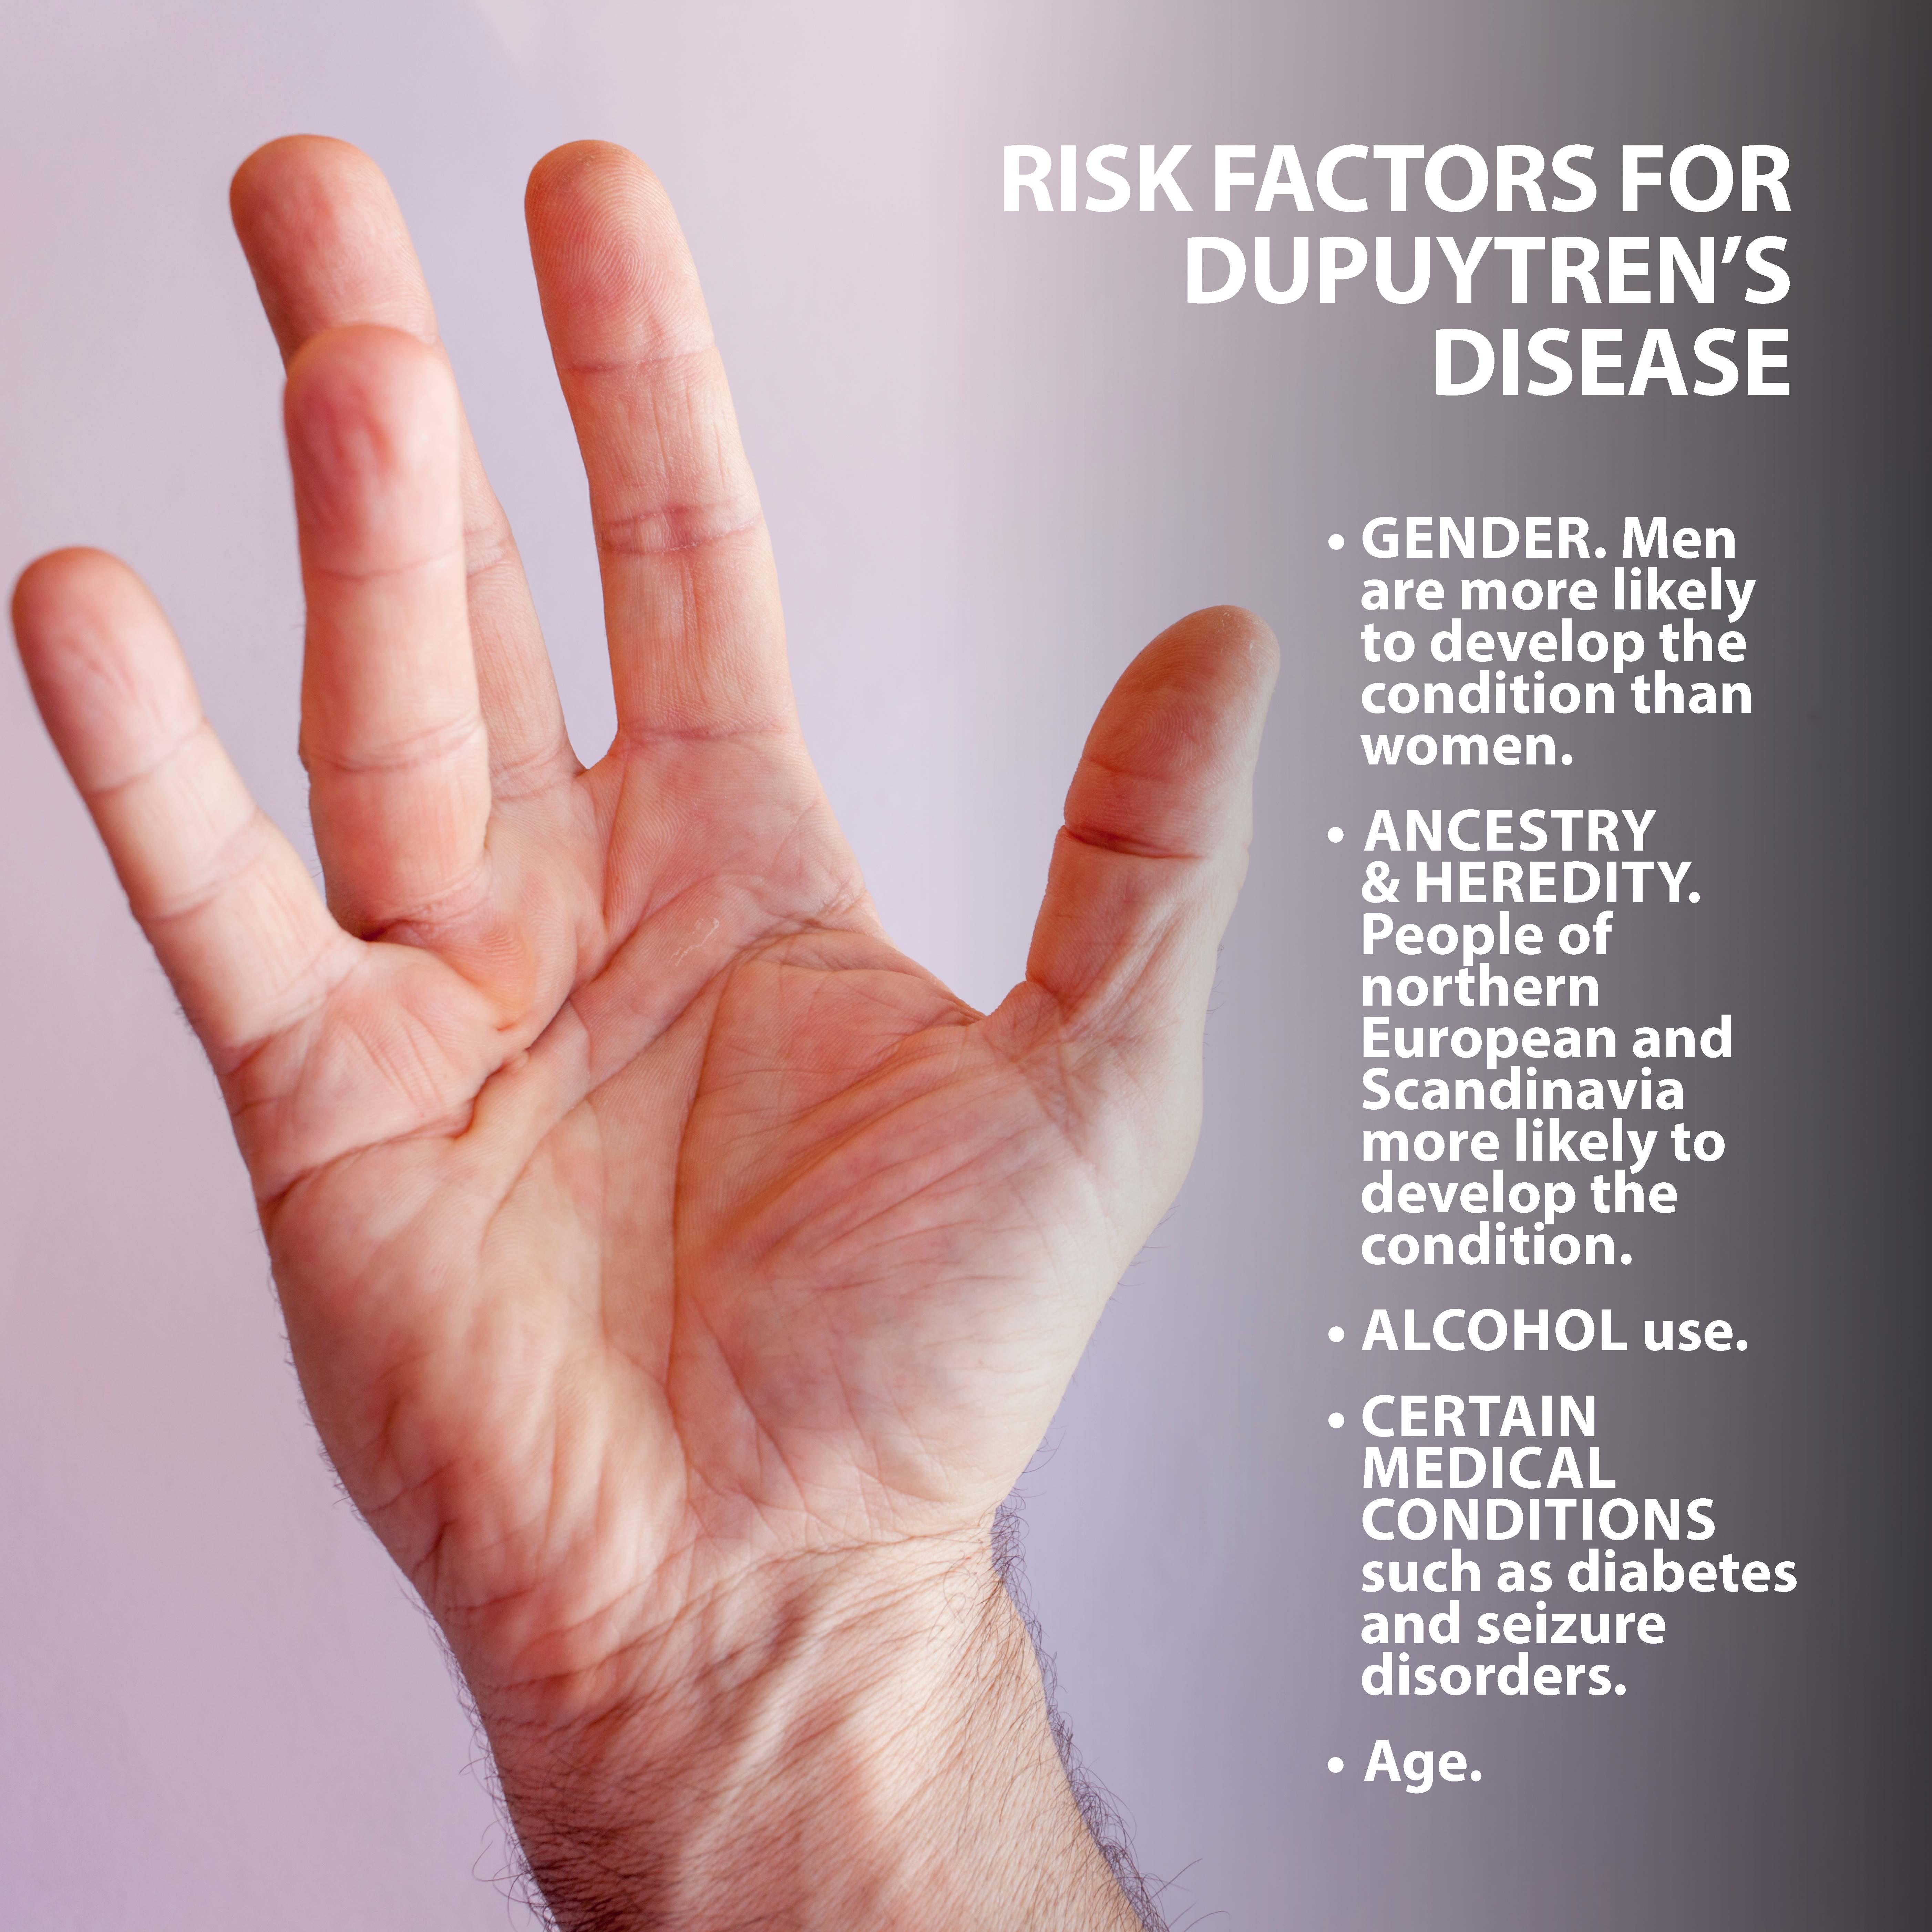 Dupuytren's Disease Risk Factors Graphic